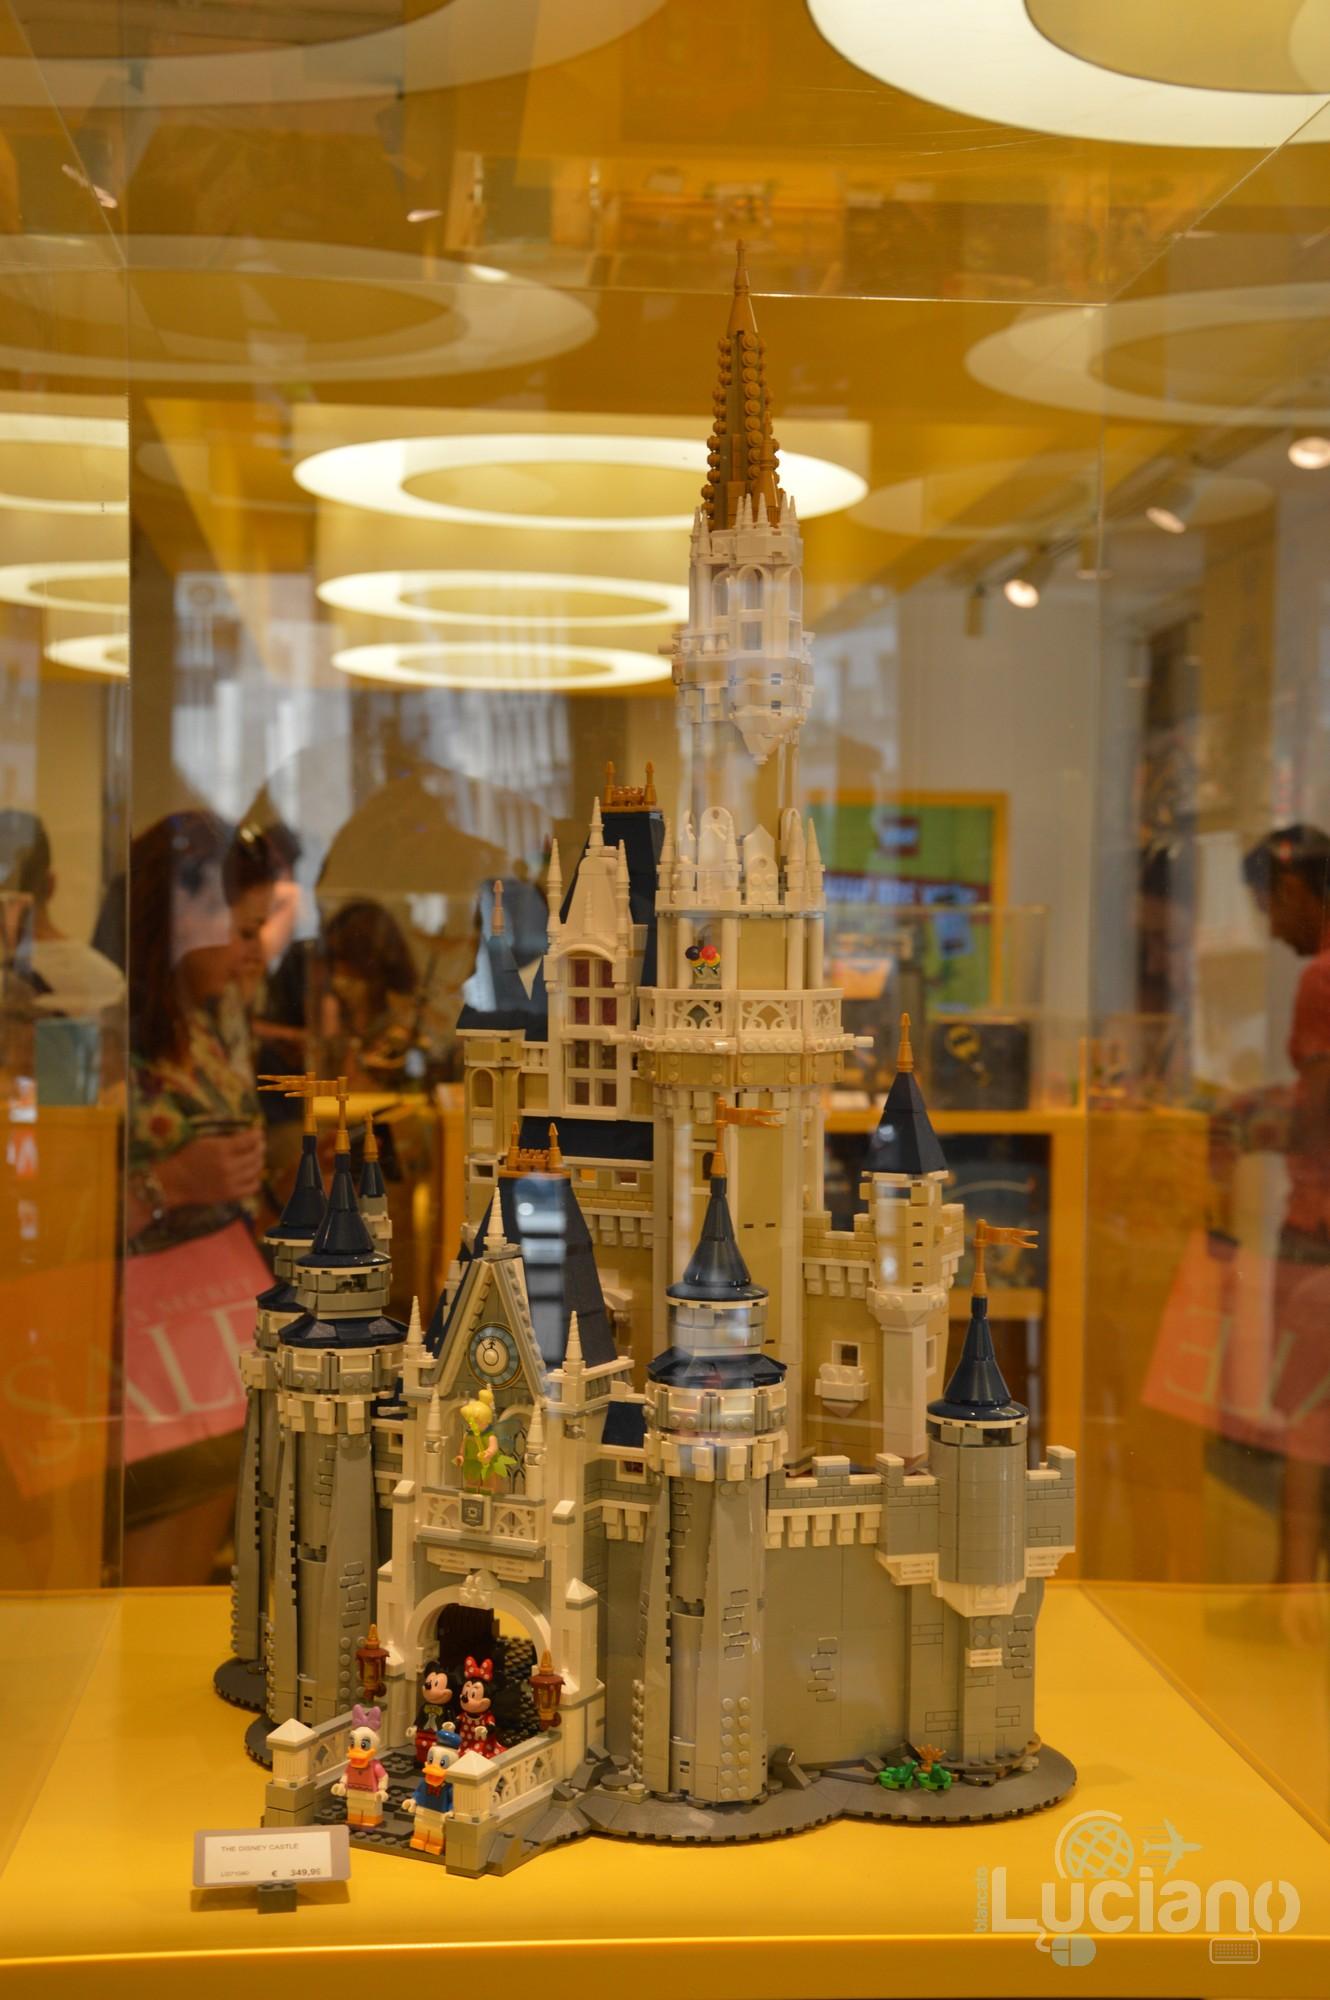 Lego Store - Modellino Castello Walt Disney - Milano - Lombardia - Italia